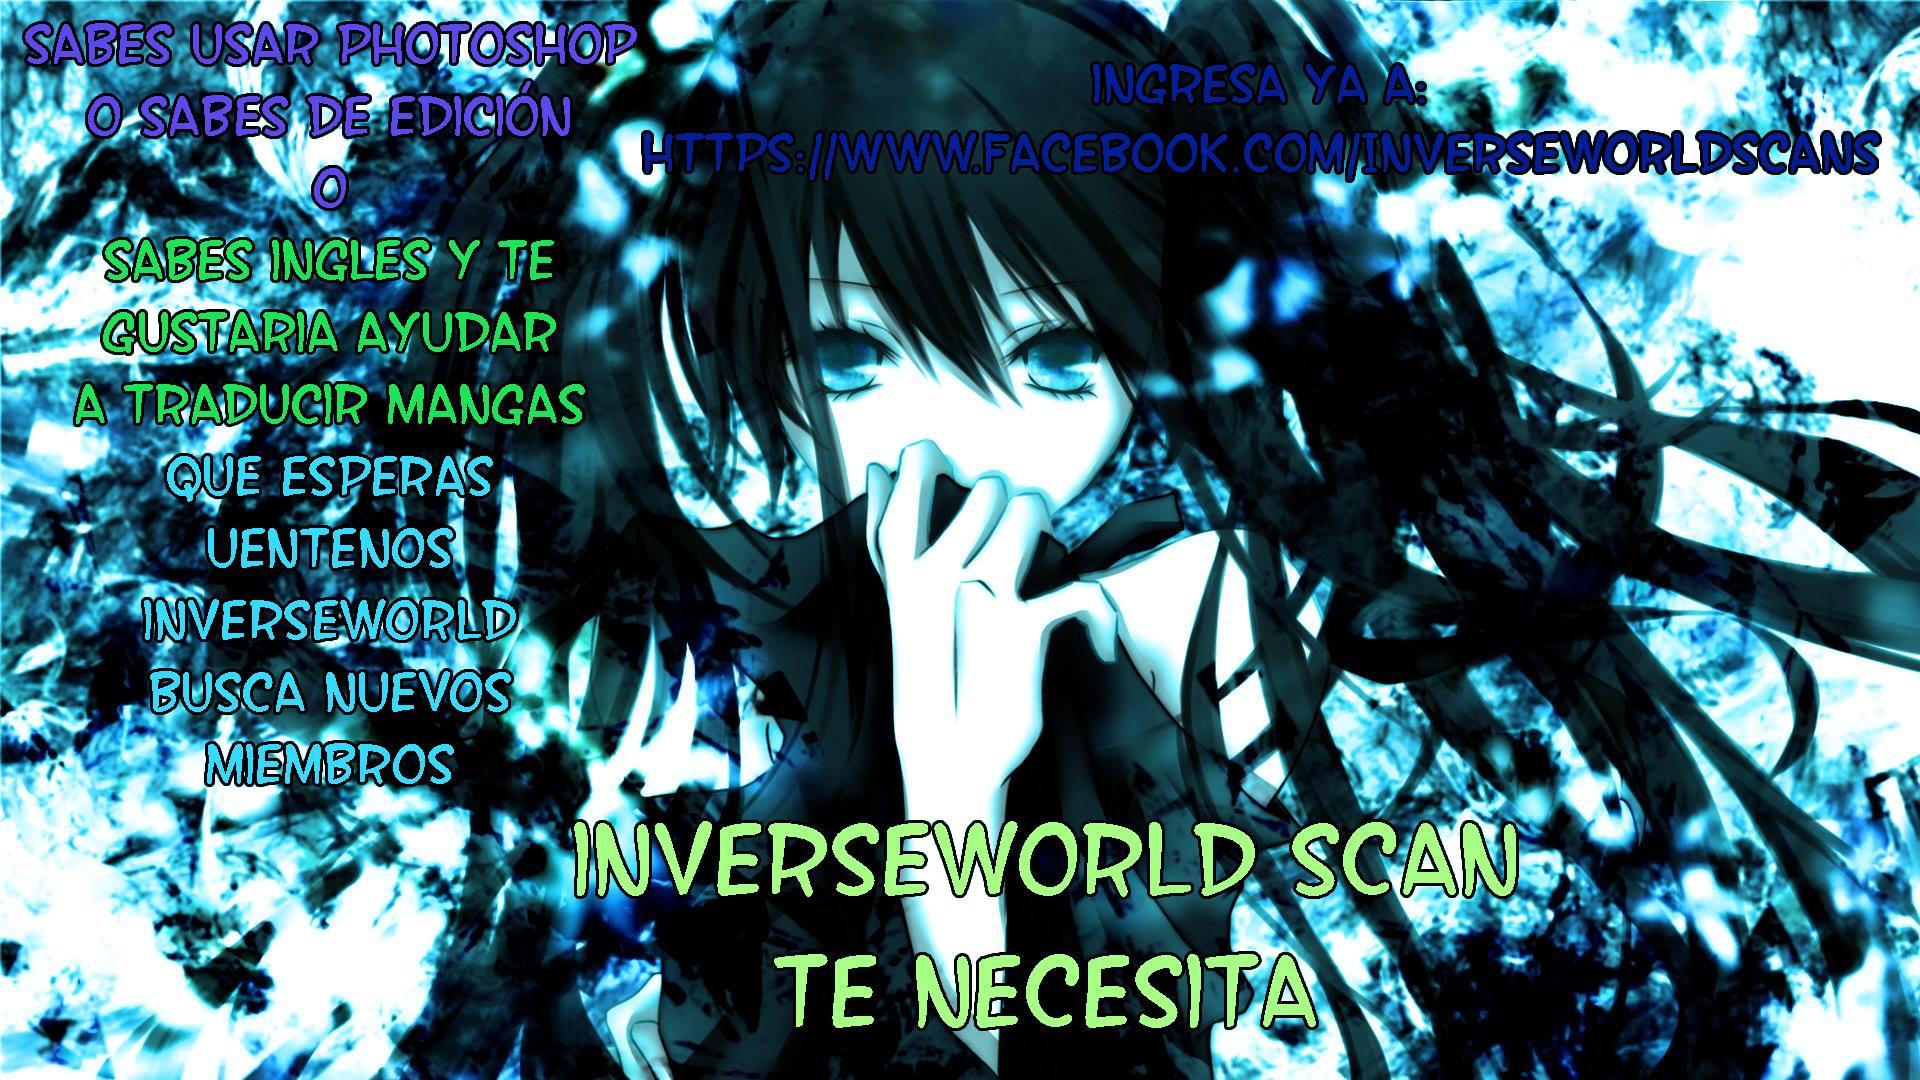 https://c5.mangatag.com/es_manga/10/14602/390661/2d0cca95ad6a2061d208d765e79af478.jpg Page 1